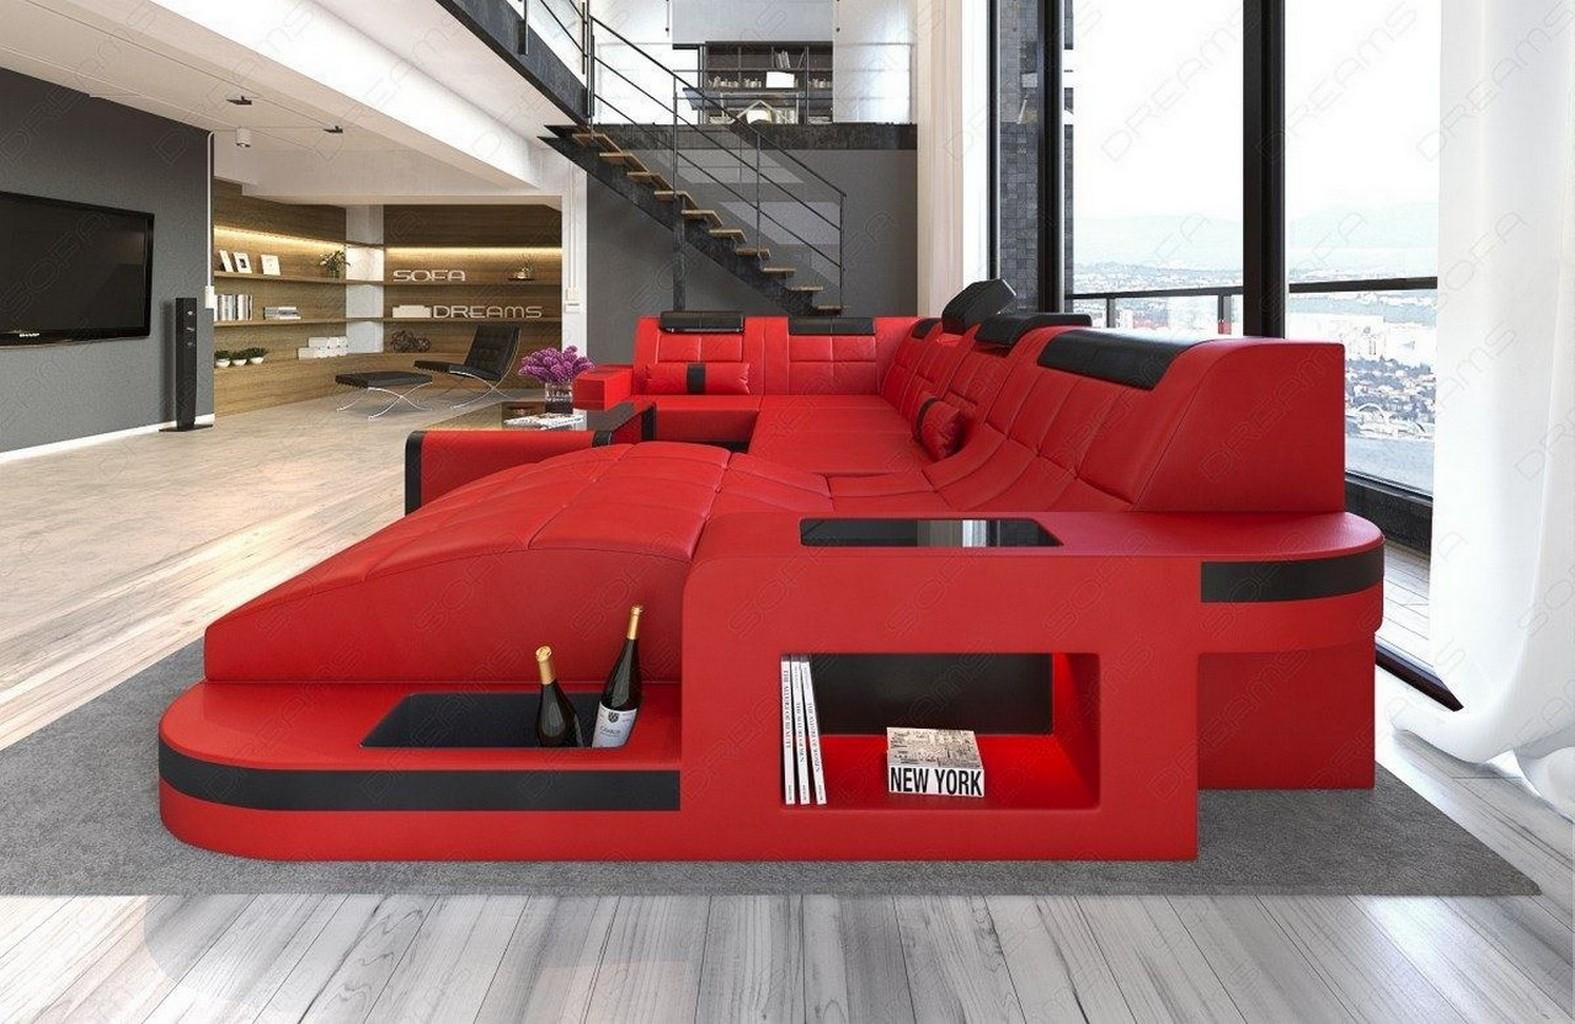 wohnlandschaft wave u form led grosses luxussofa ottomane megasofa rot schwarz ebay